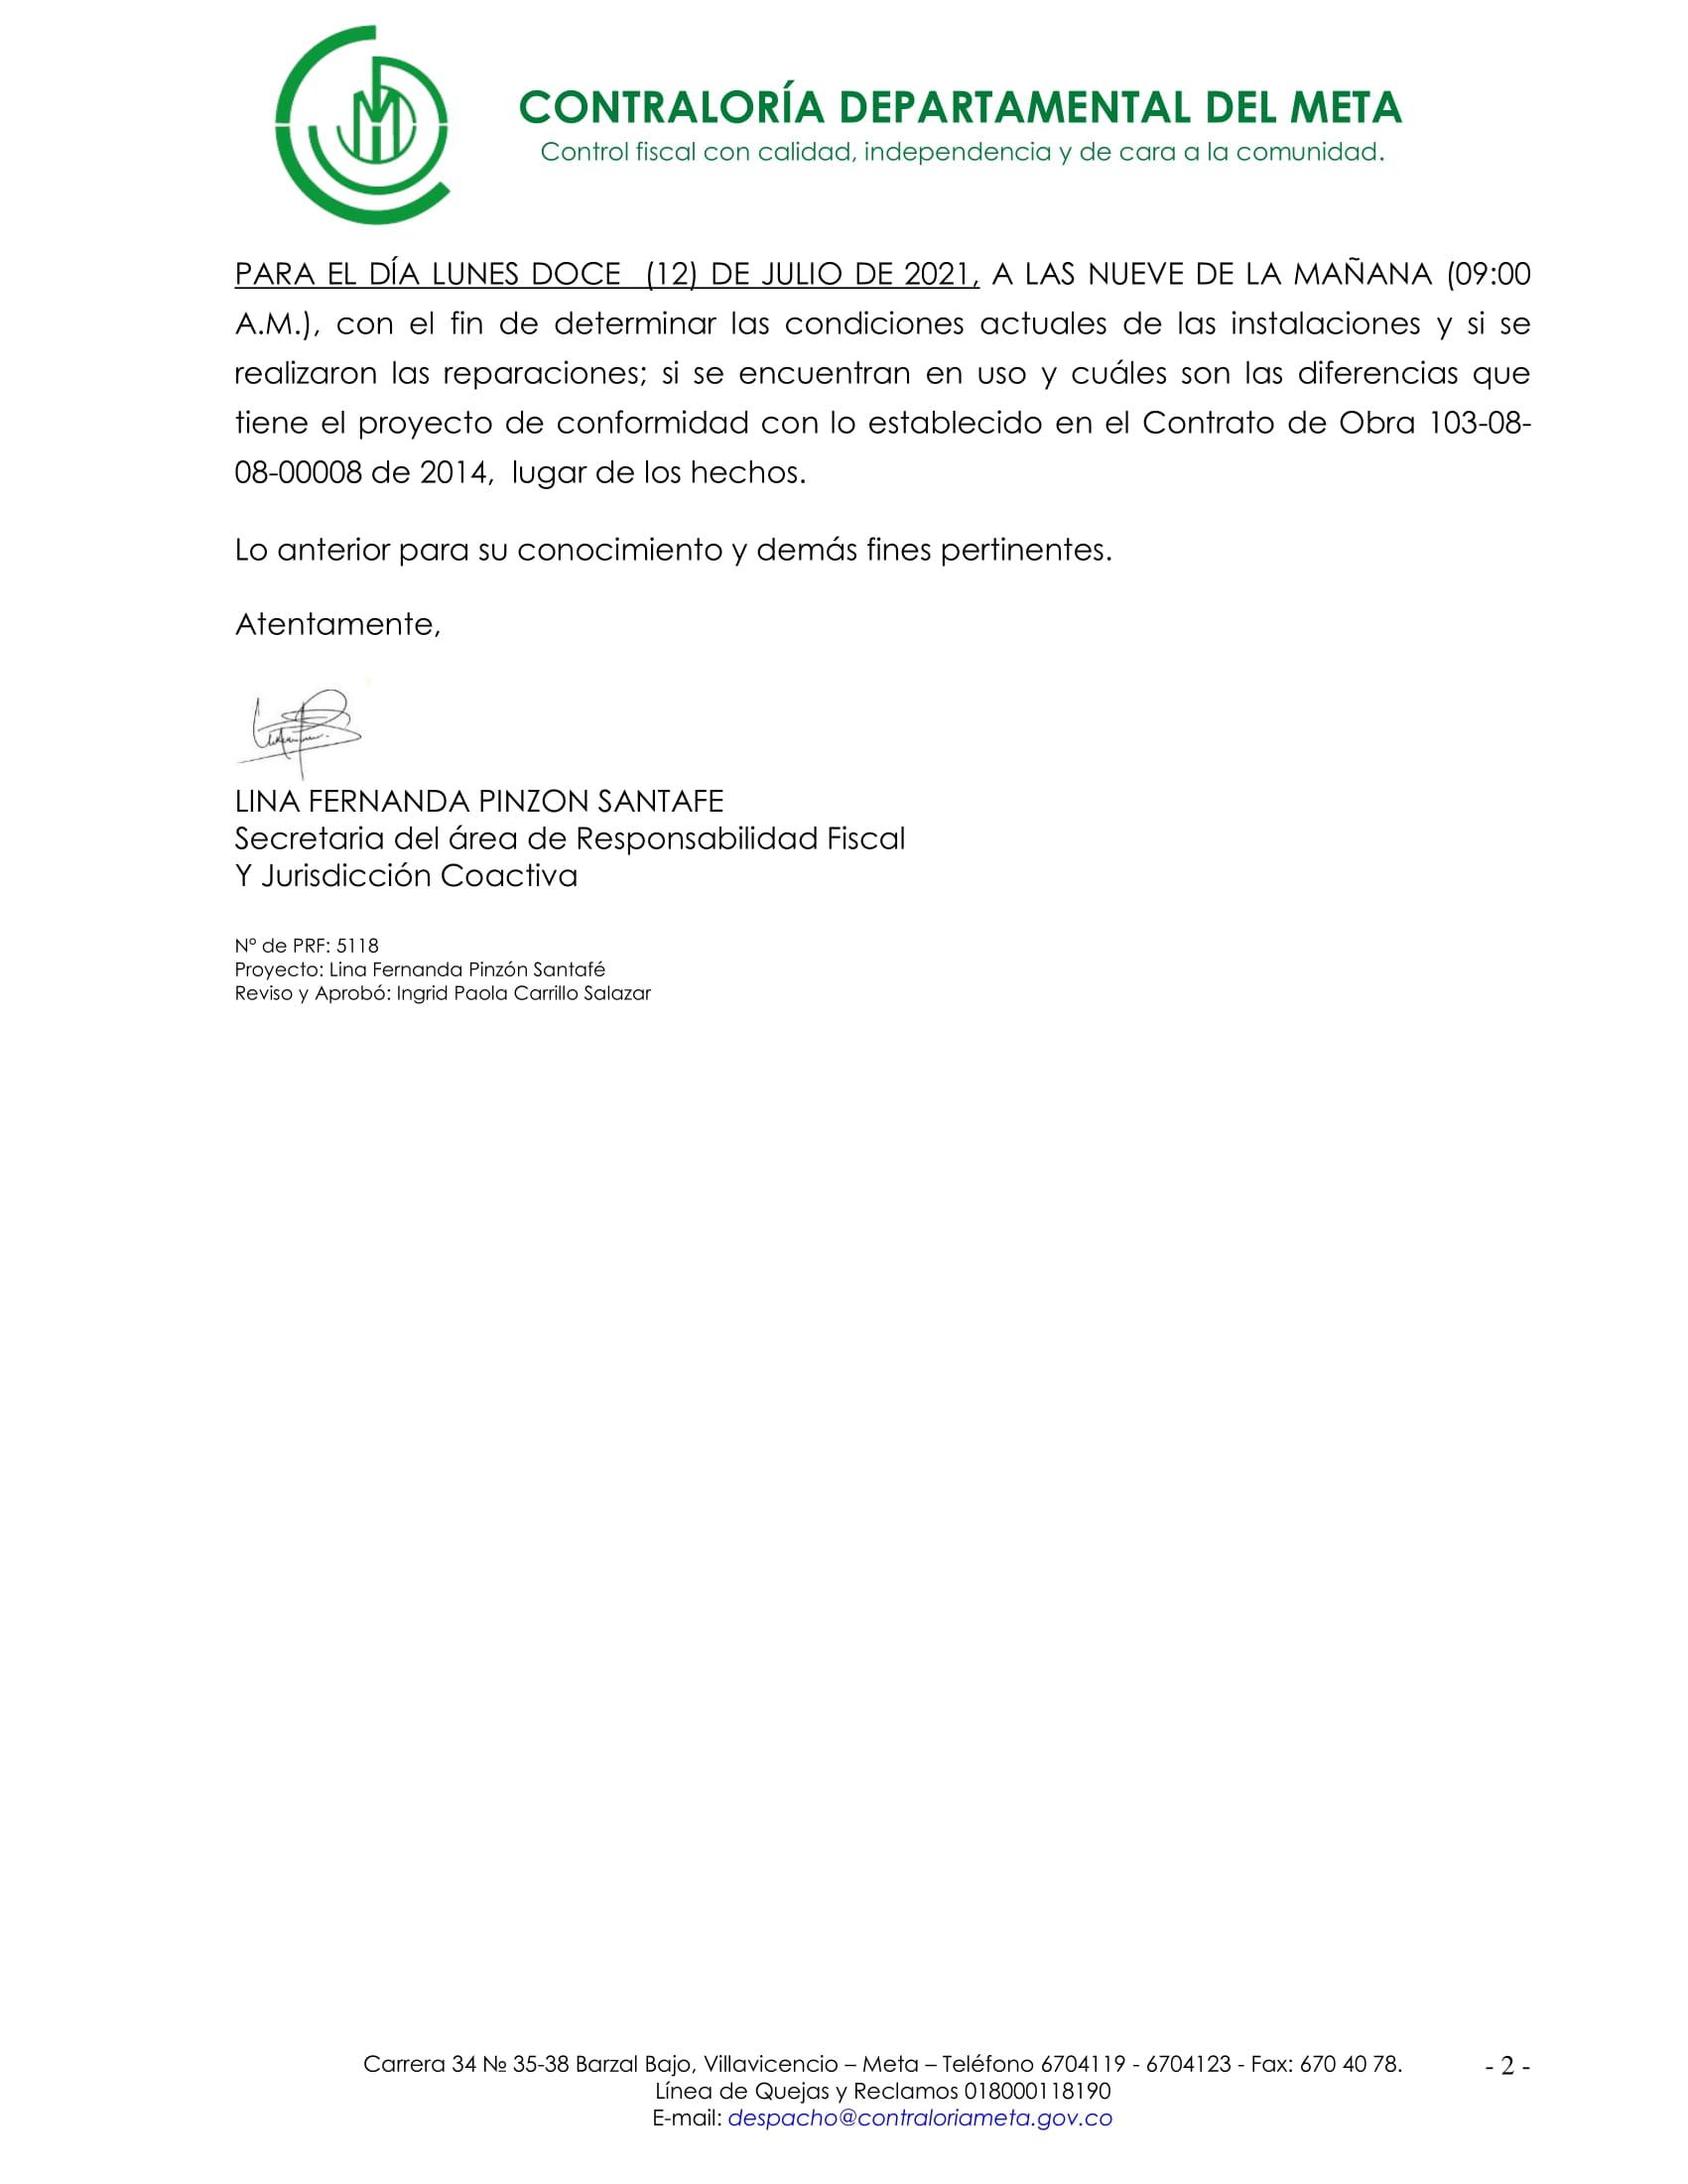 not-elec-camilo-garzon-prf-5118-2